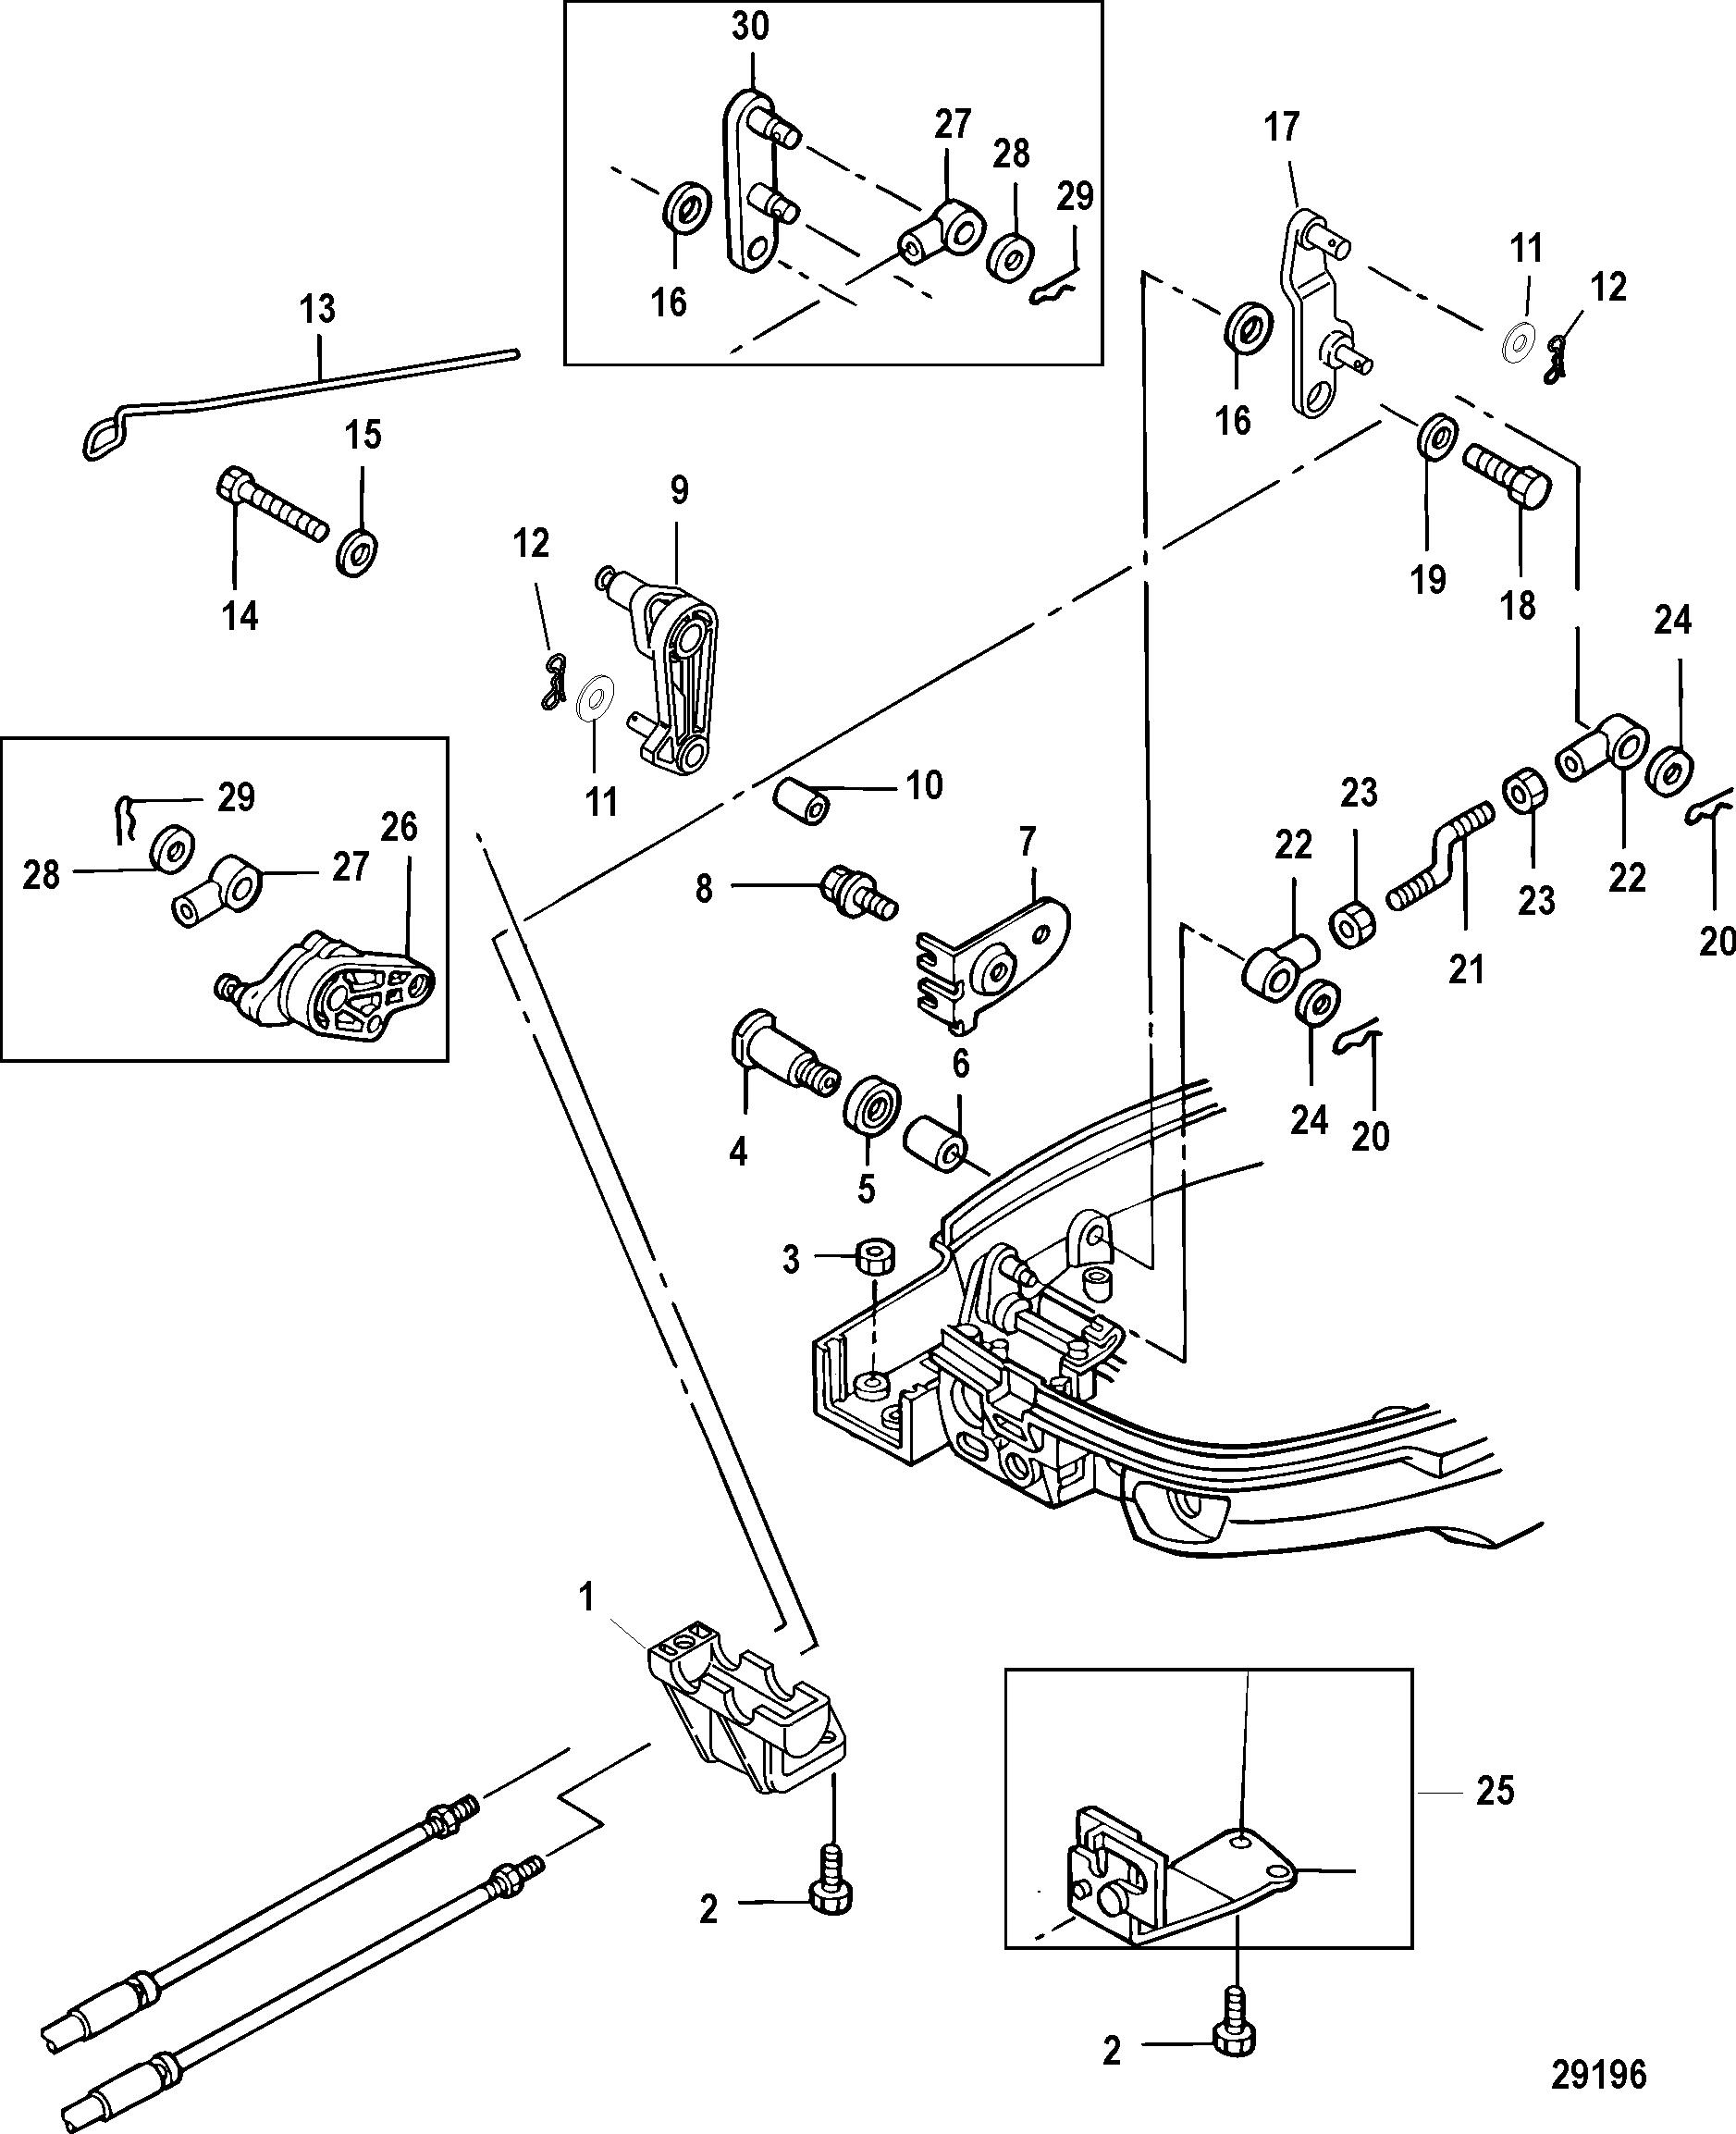 Volvo Penta Shift Cable Diagram